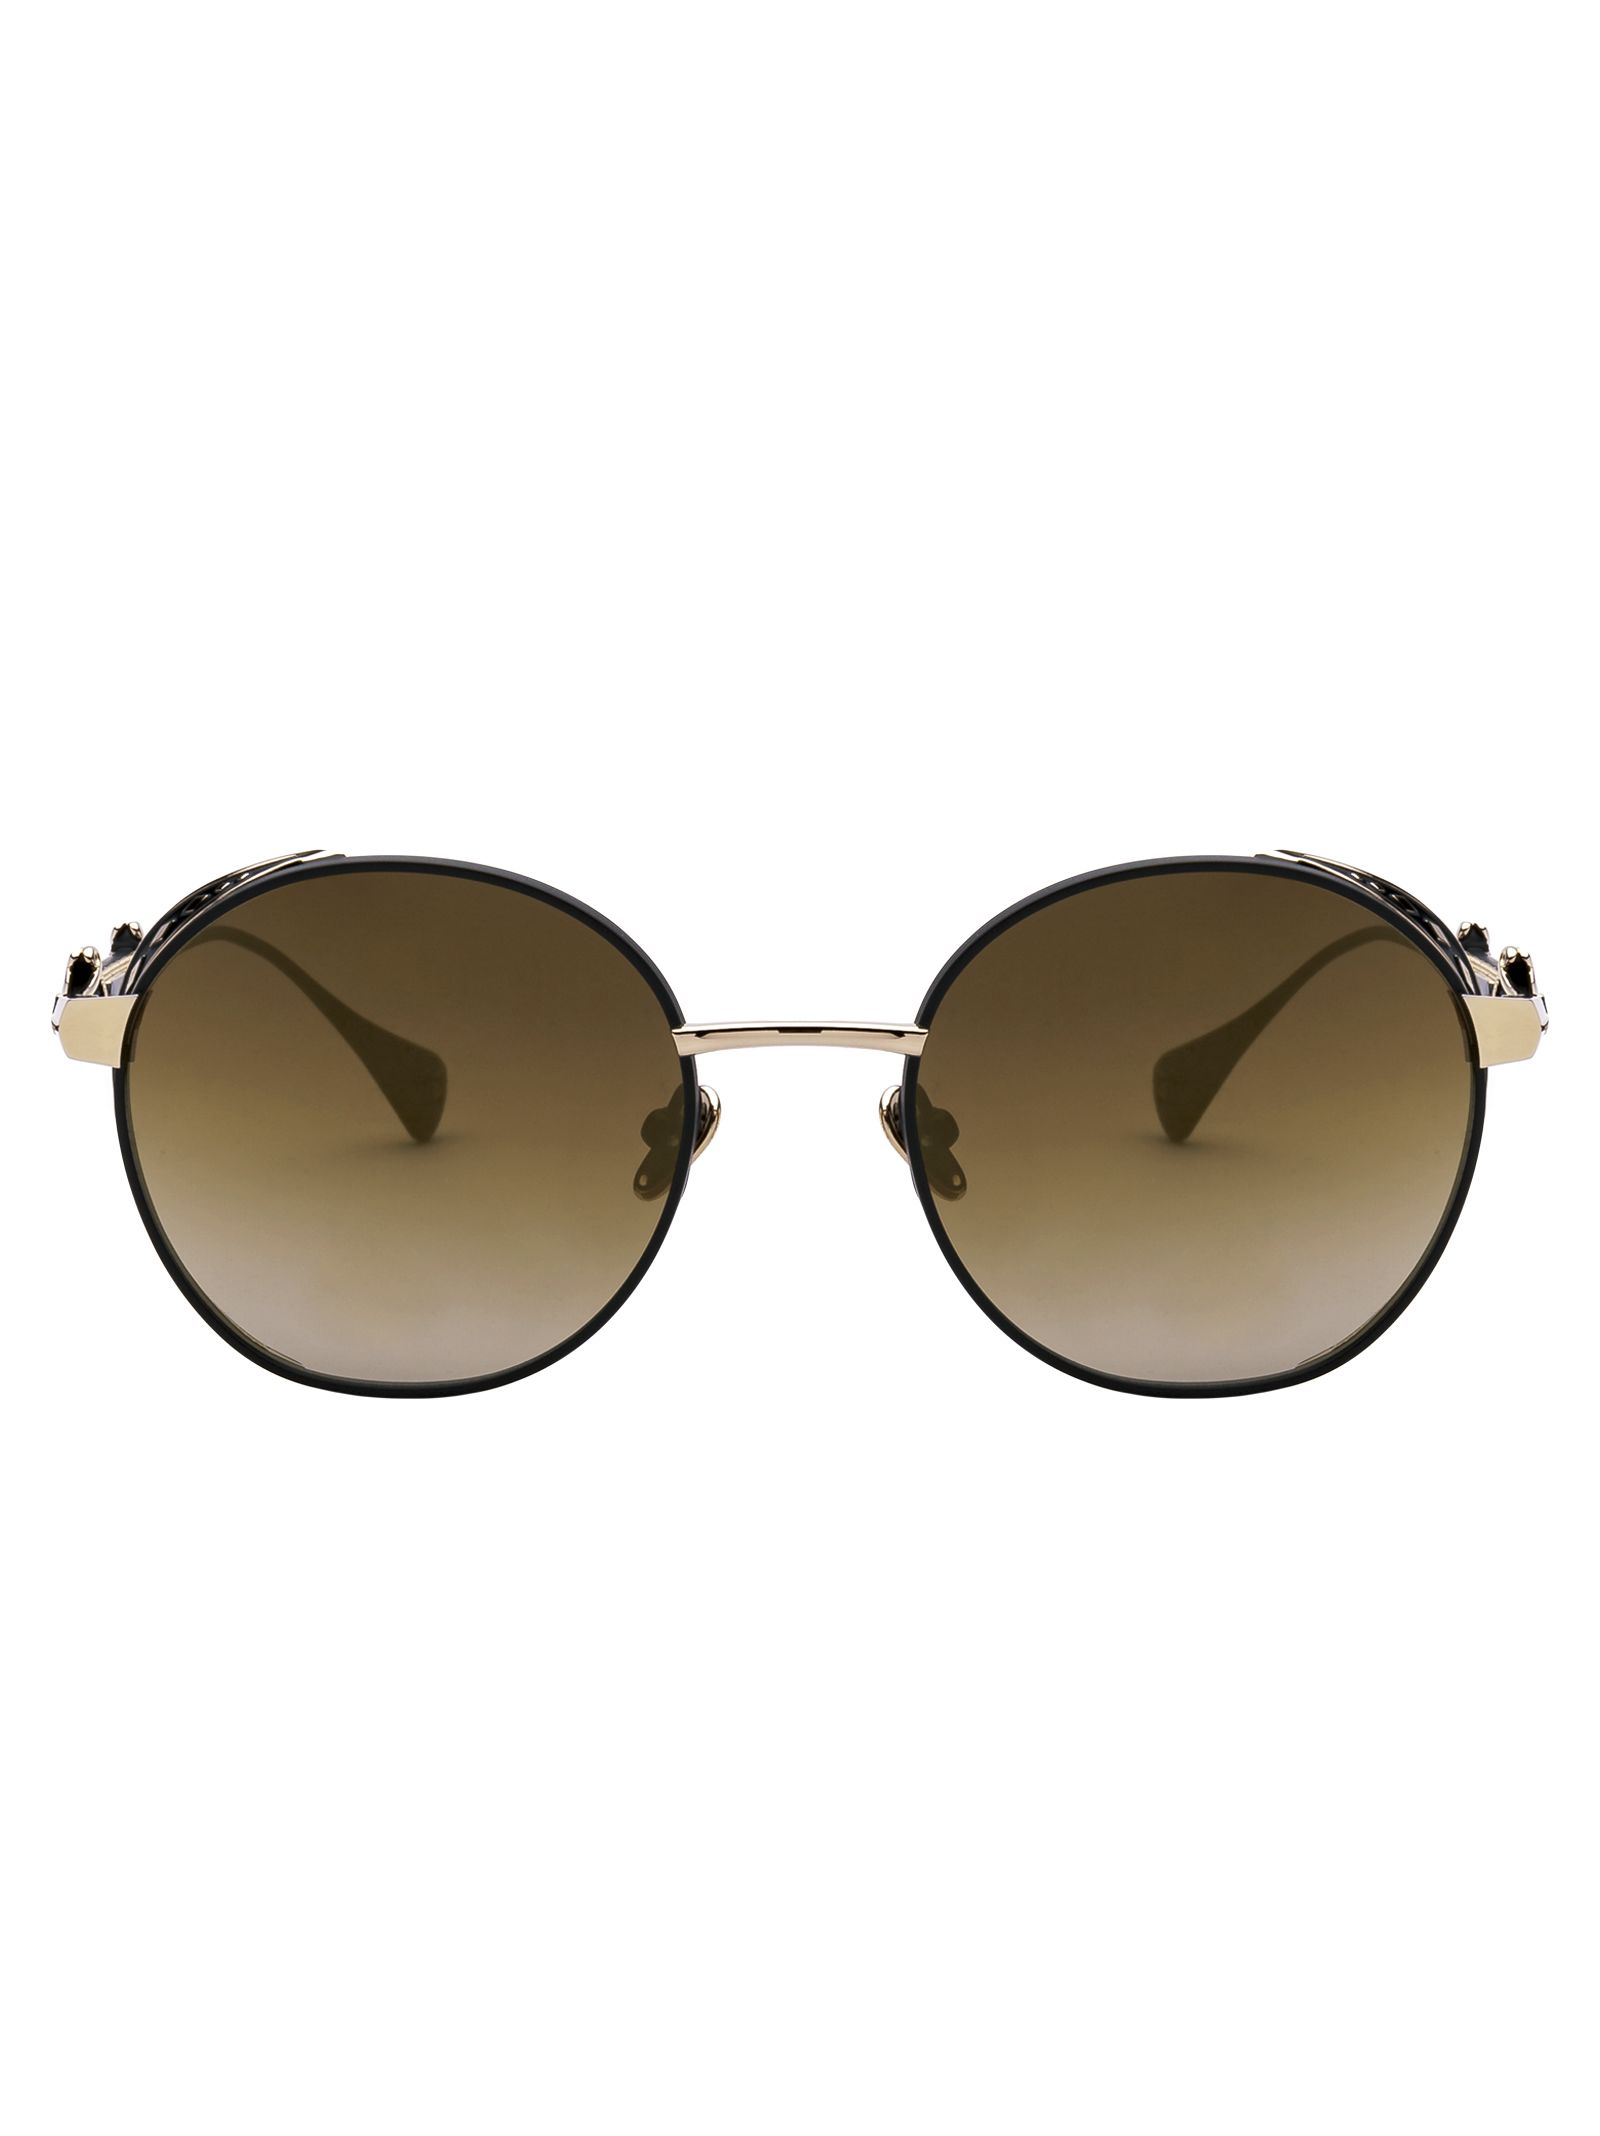 Frency & Mercury Cockpit Sunglasses